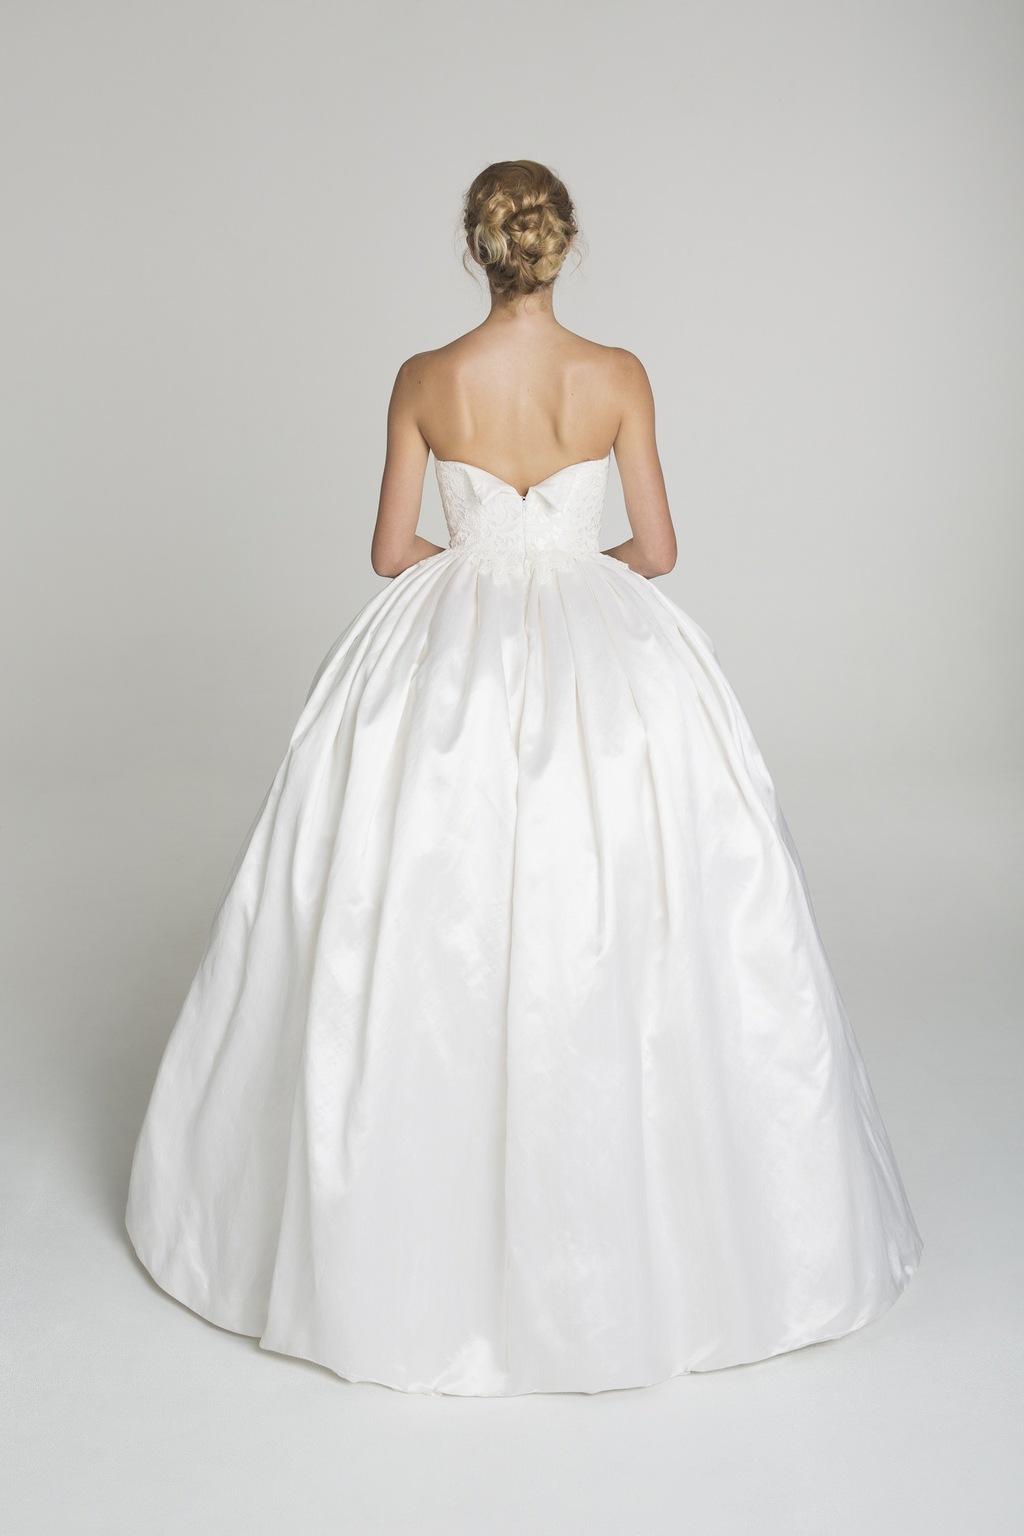 Simple Ball Gown Wedding Dress From Alana Aoun Backfull